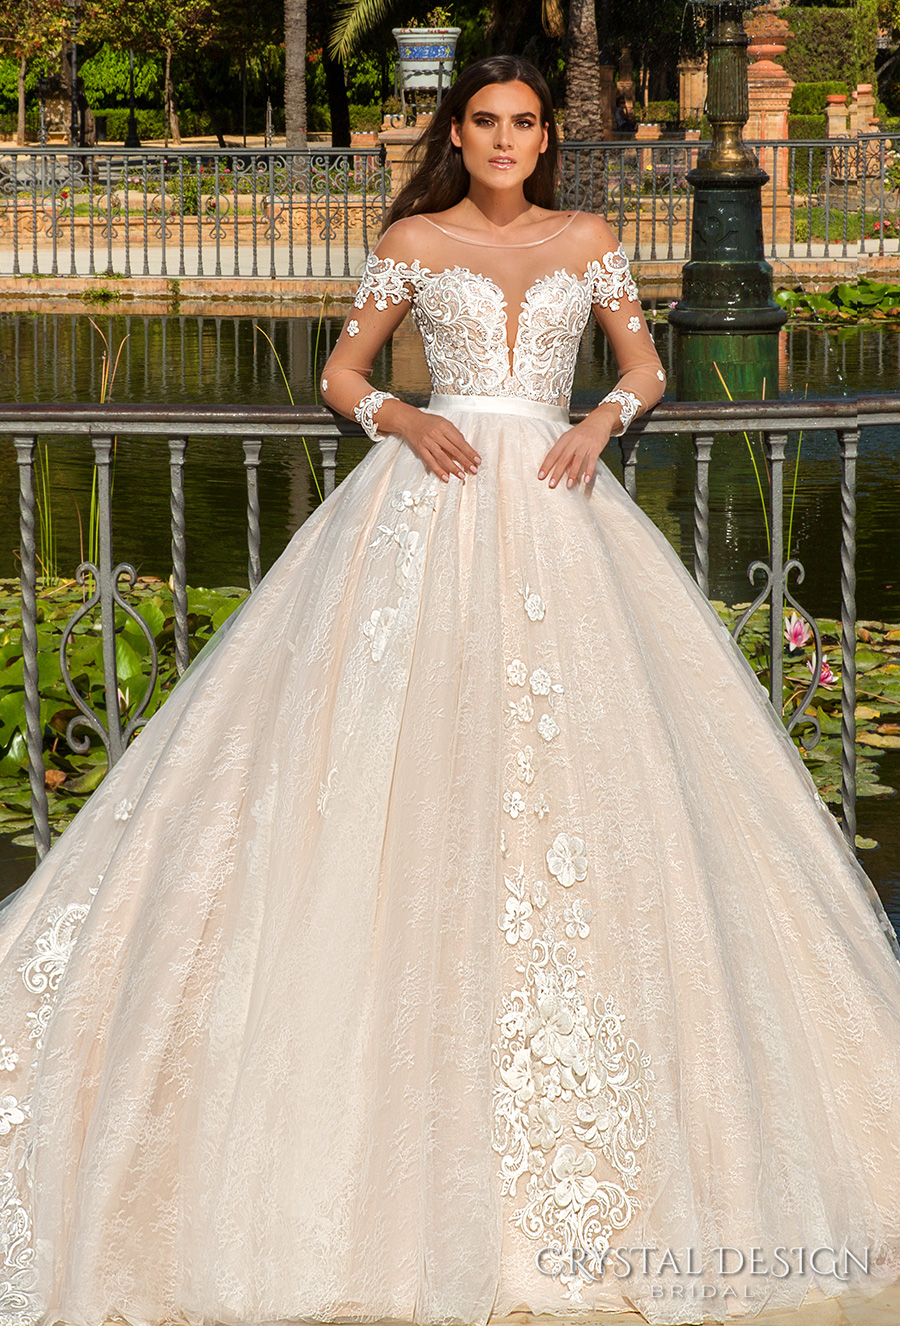 Crystal Design 2017 Bridal Long Sleeves Sheer Bateau Deep Plunging